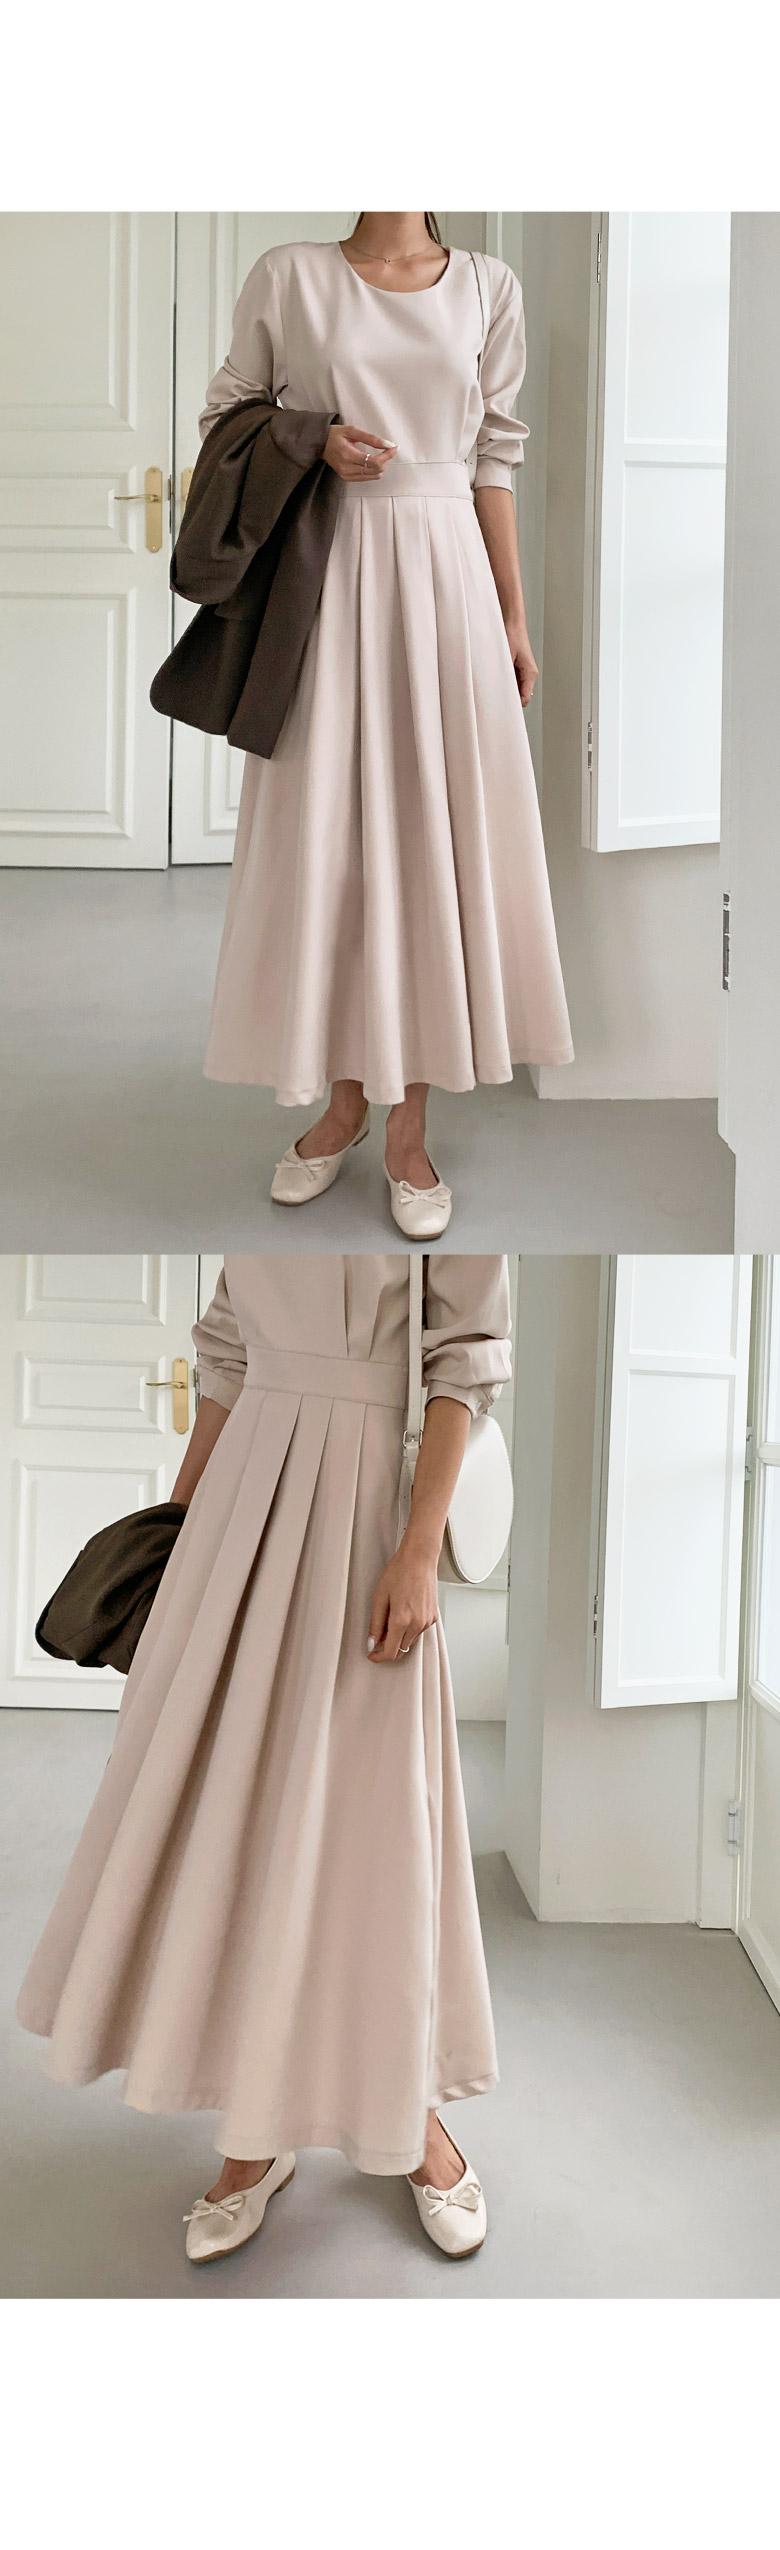 Kate Pintuck Pleats Long Dress